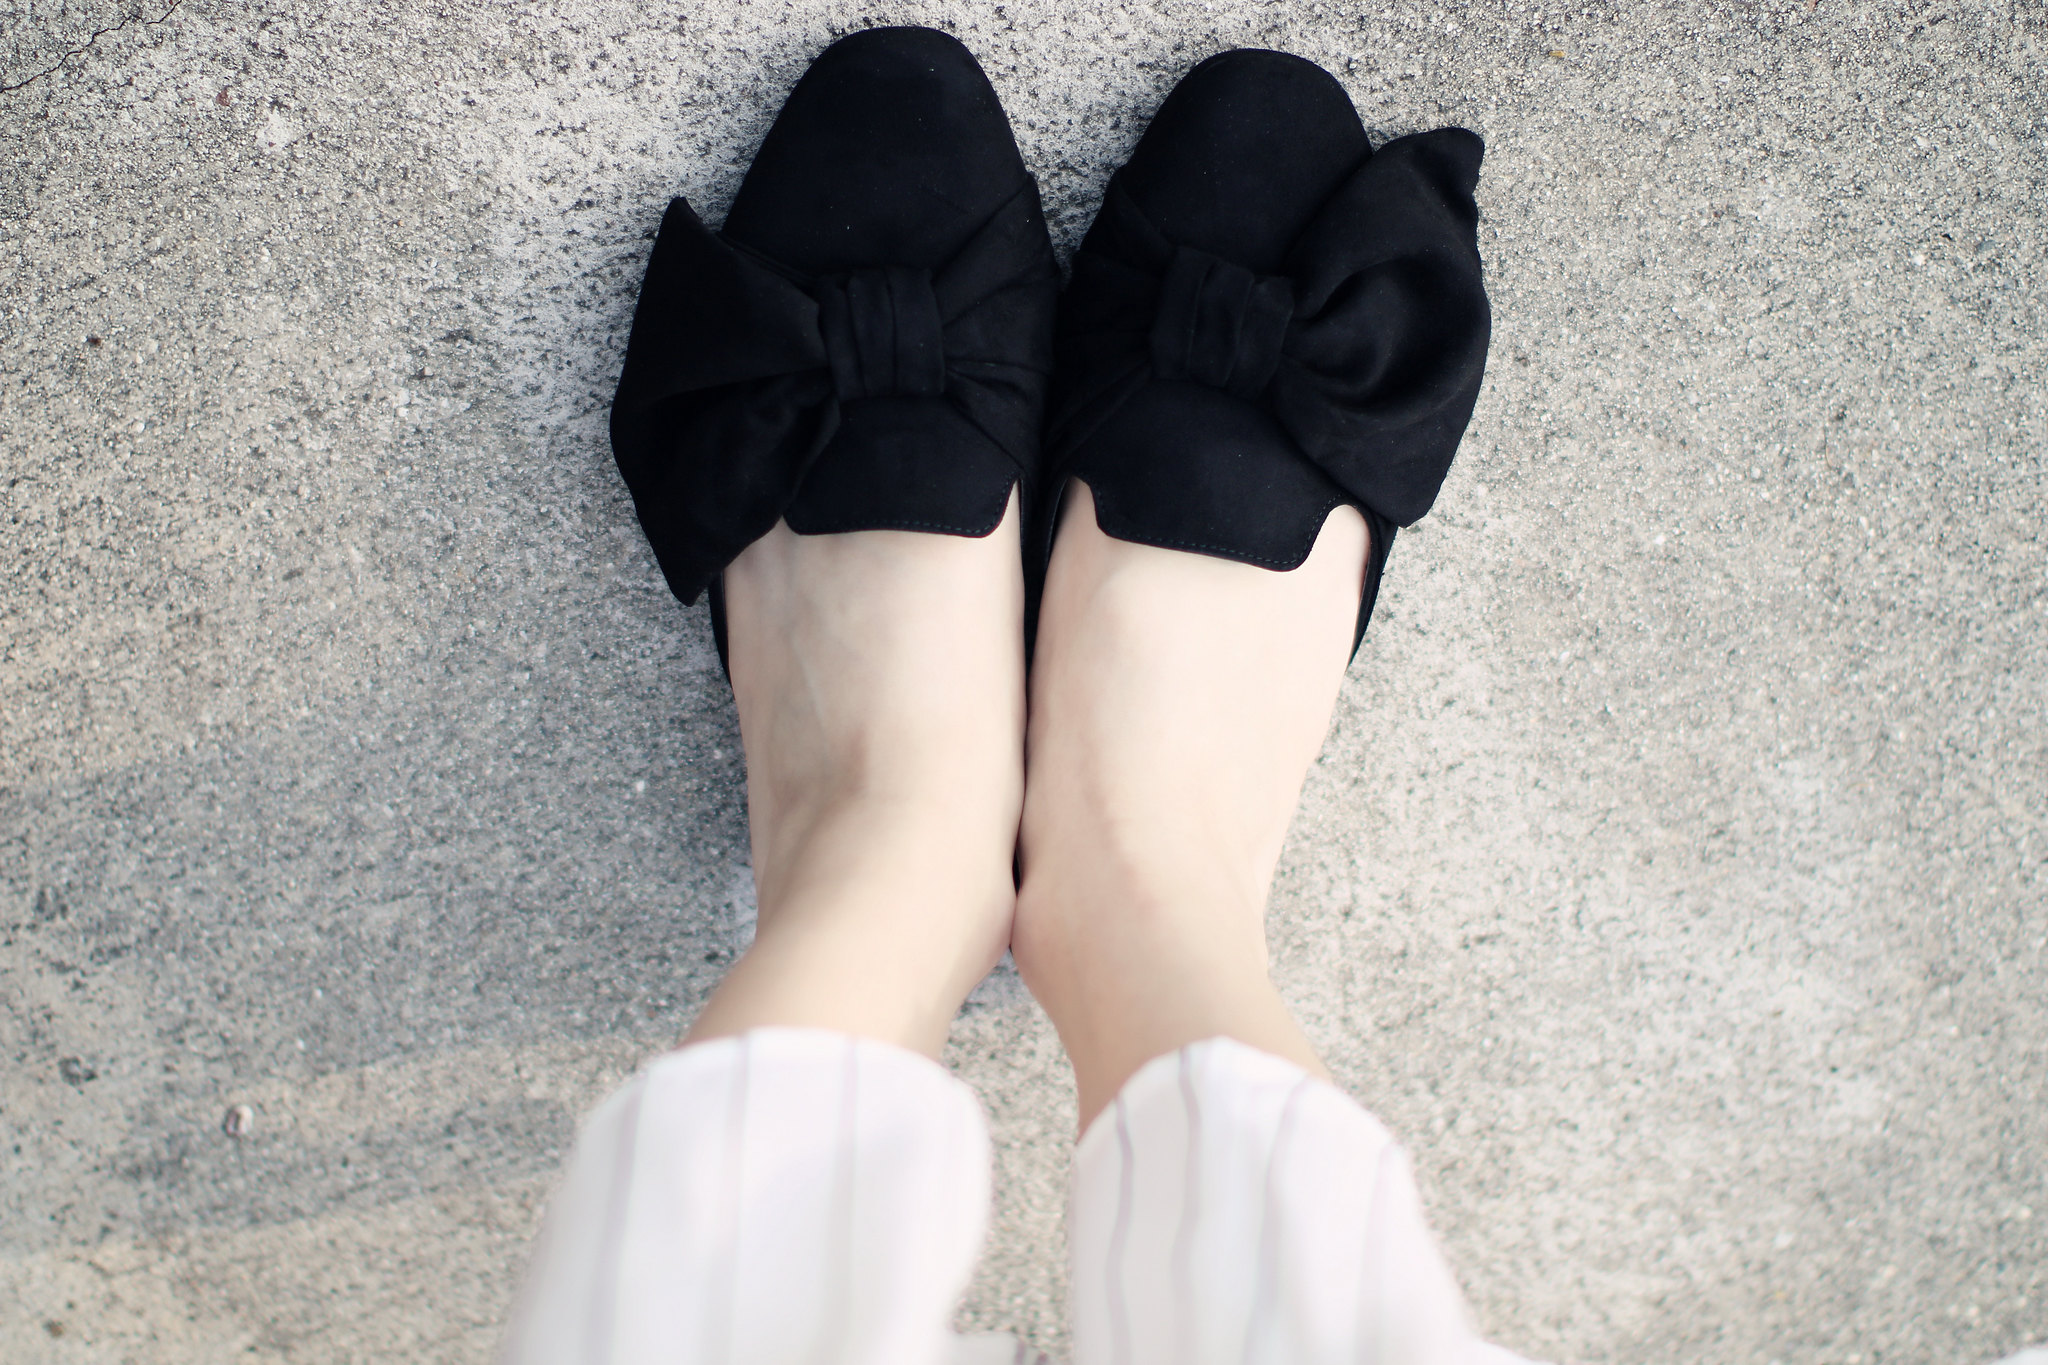 5276-ootd-fashion-style-outfitoftheday-wiwt-streetstyle-owlxfish-f21xme-romper-jumpsuit-bohochic-bershka-zara-summer-elizabeeetht-clothestoyouuu